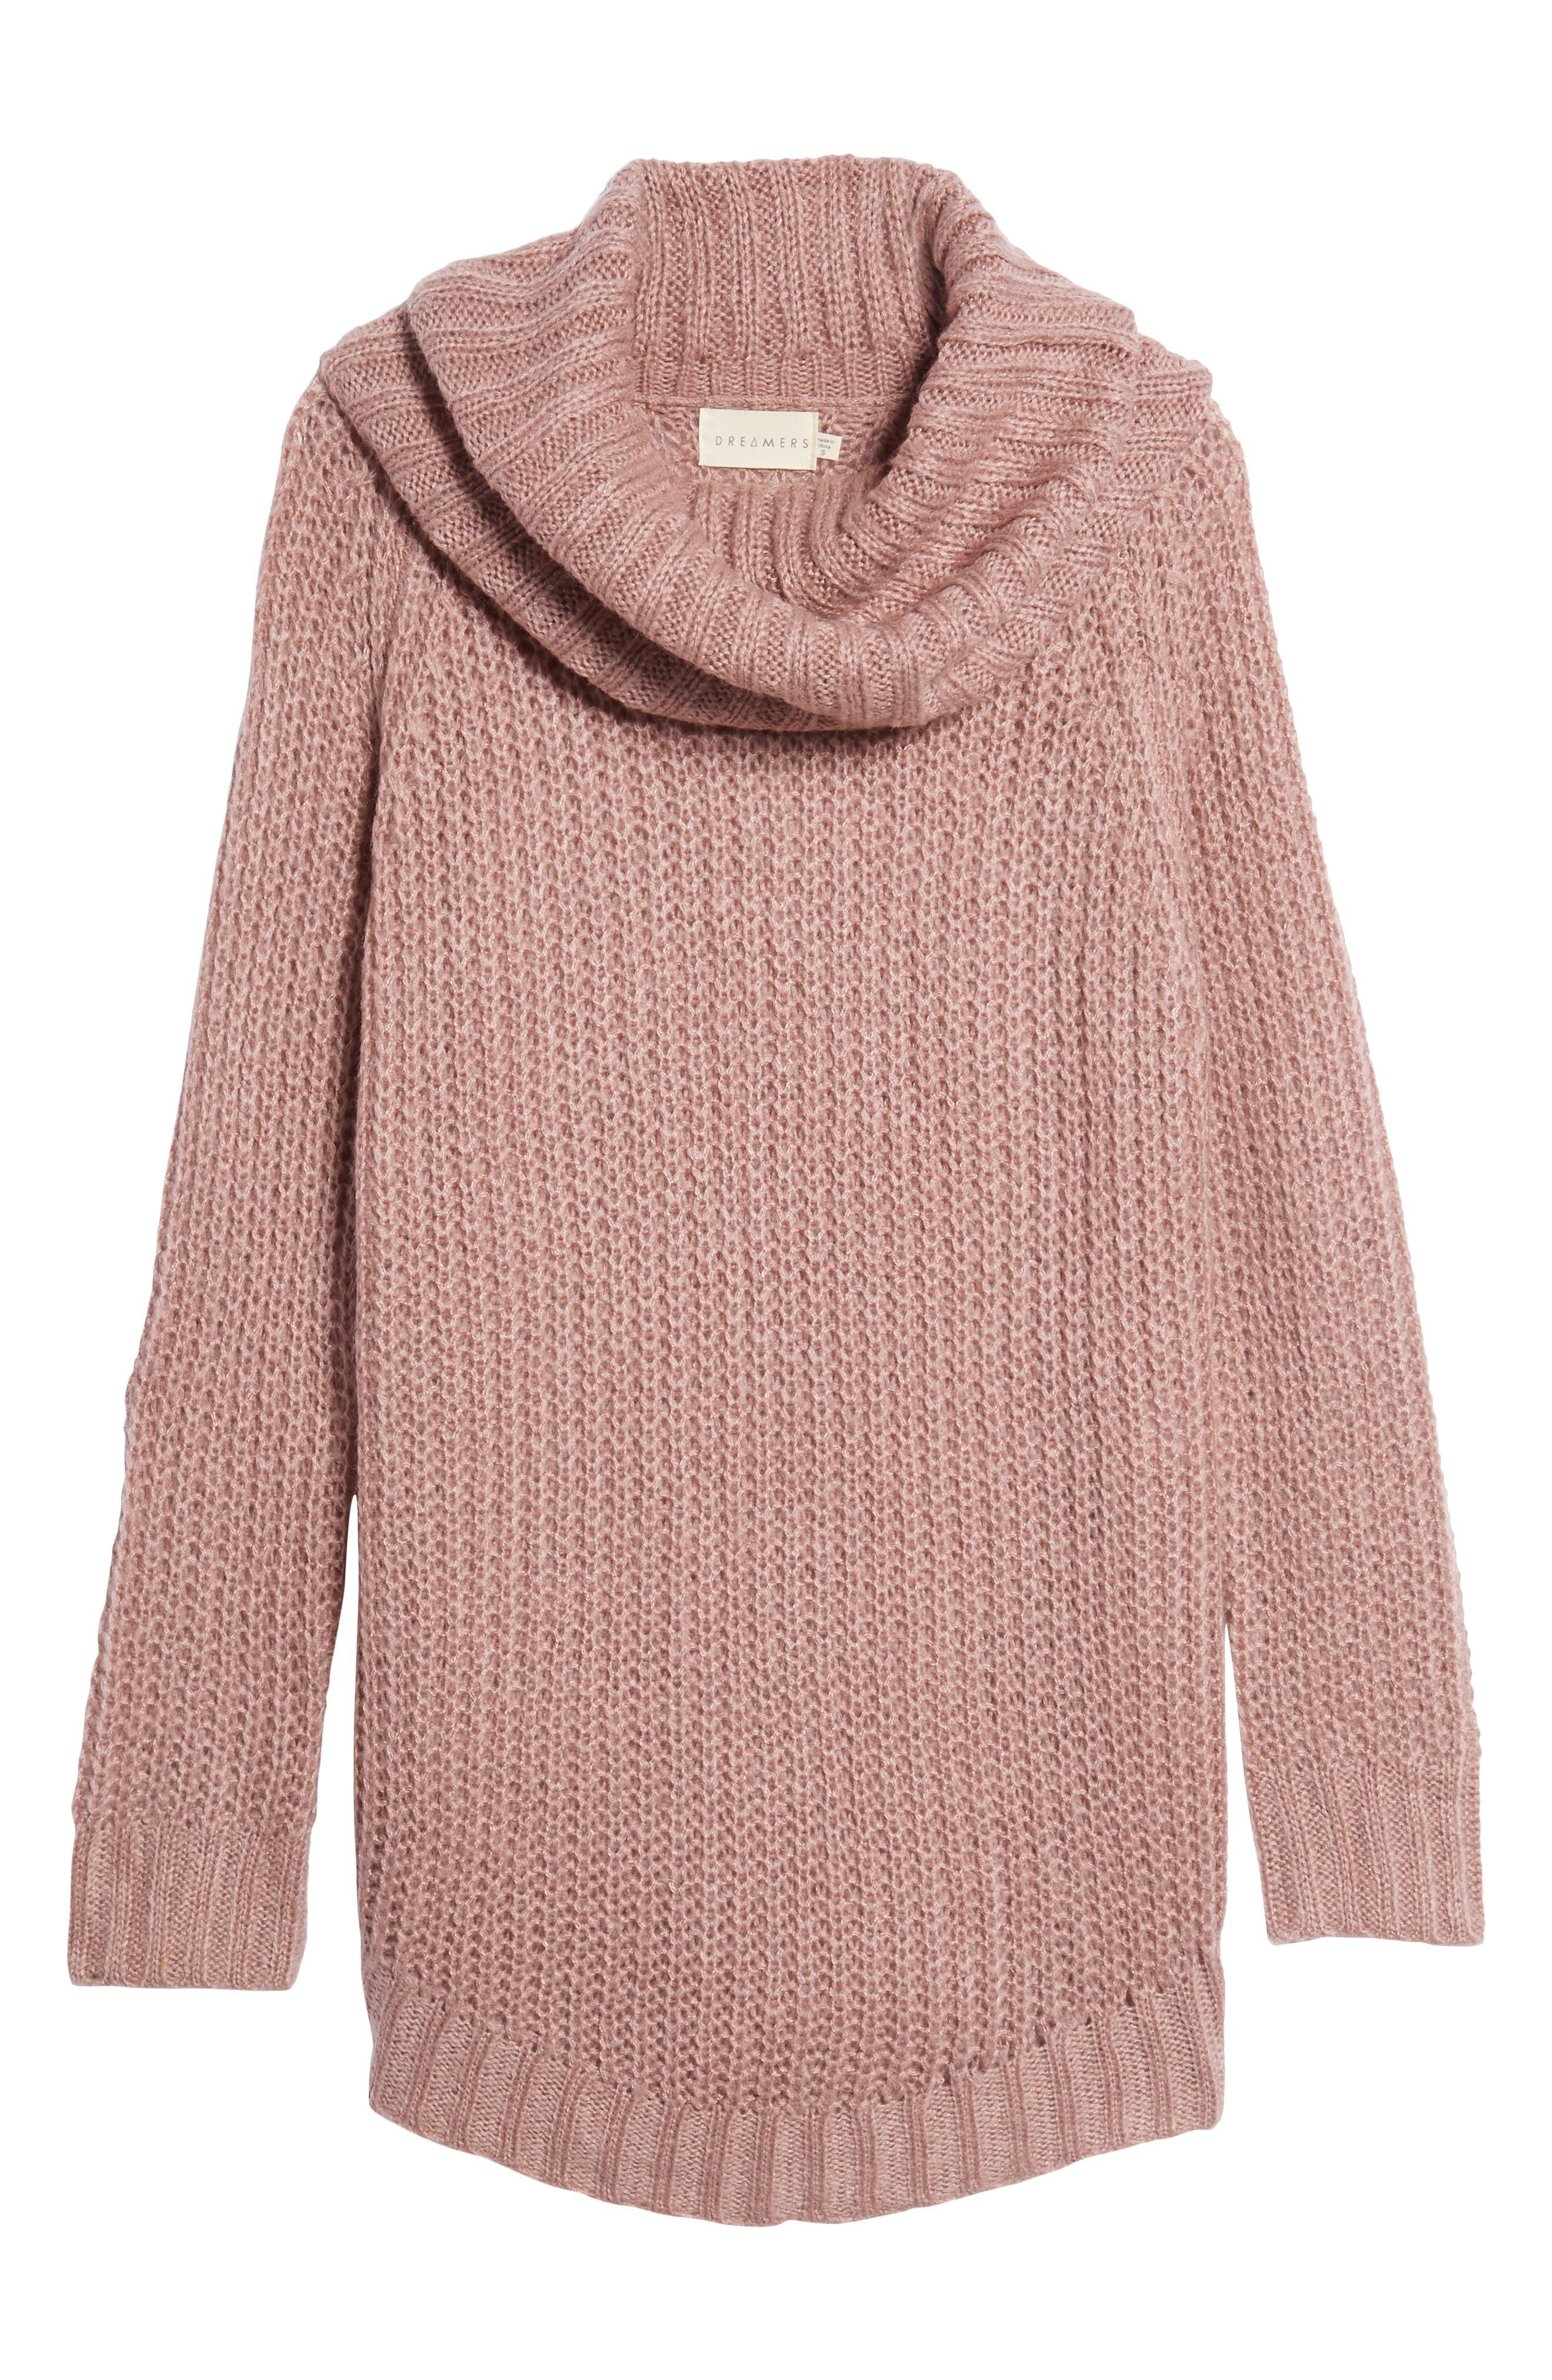 Cowl Neck Sweater,                             Alternate thumbnail 6, color,                             680